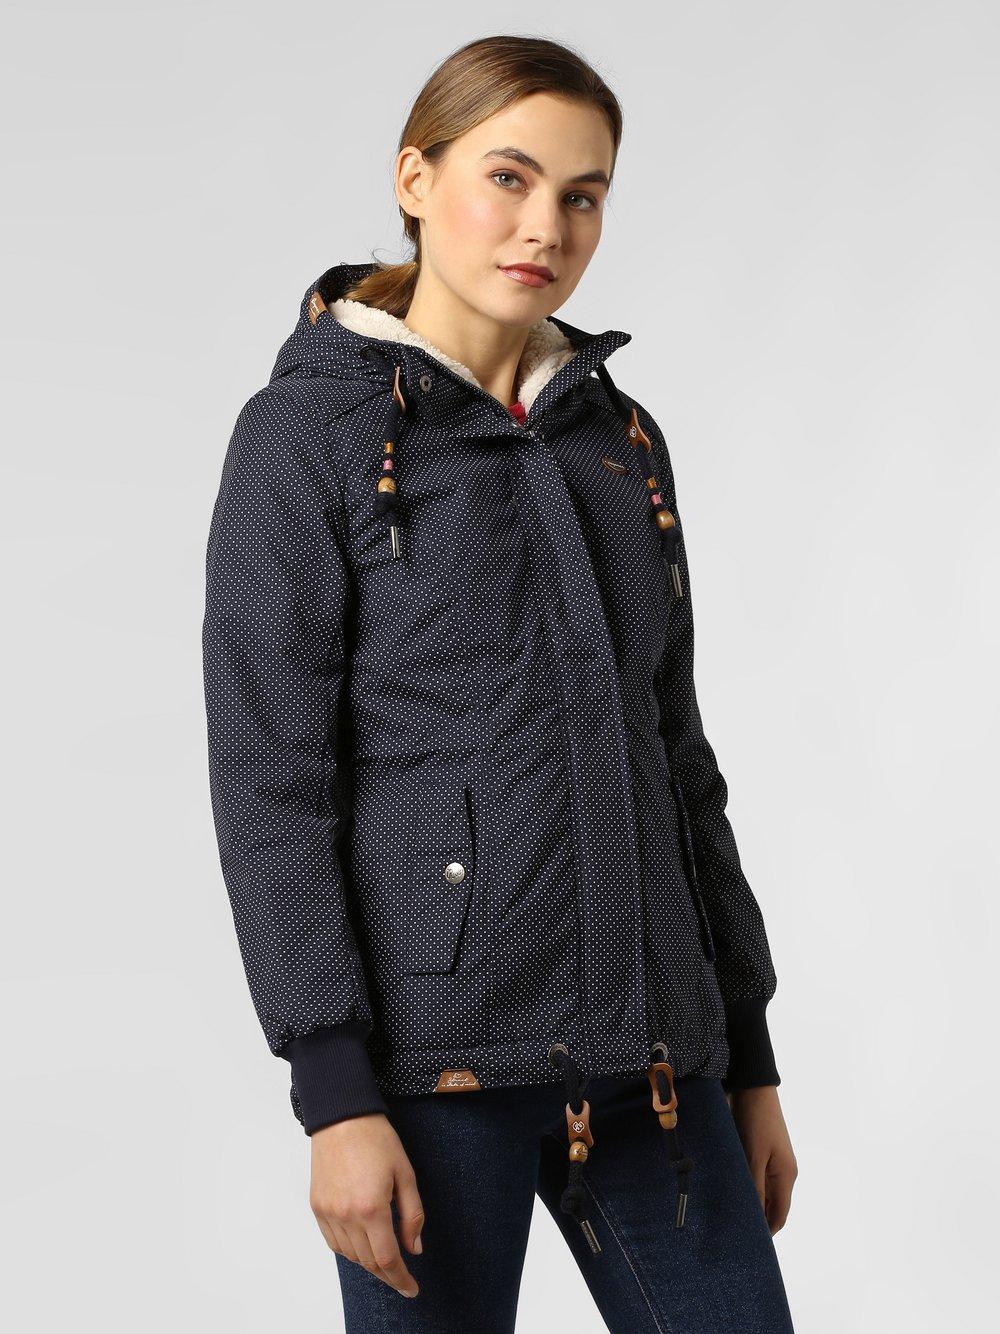 Ragwear – Kurtka damska – Danka, niebieski Van Graaf 449100-0001-09900